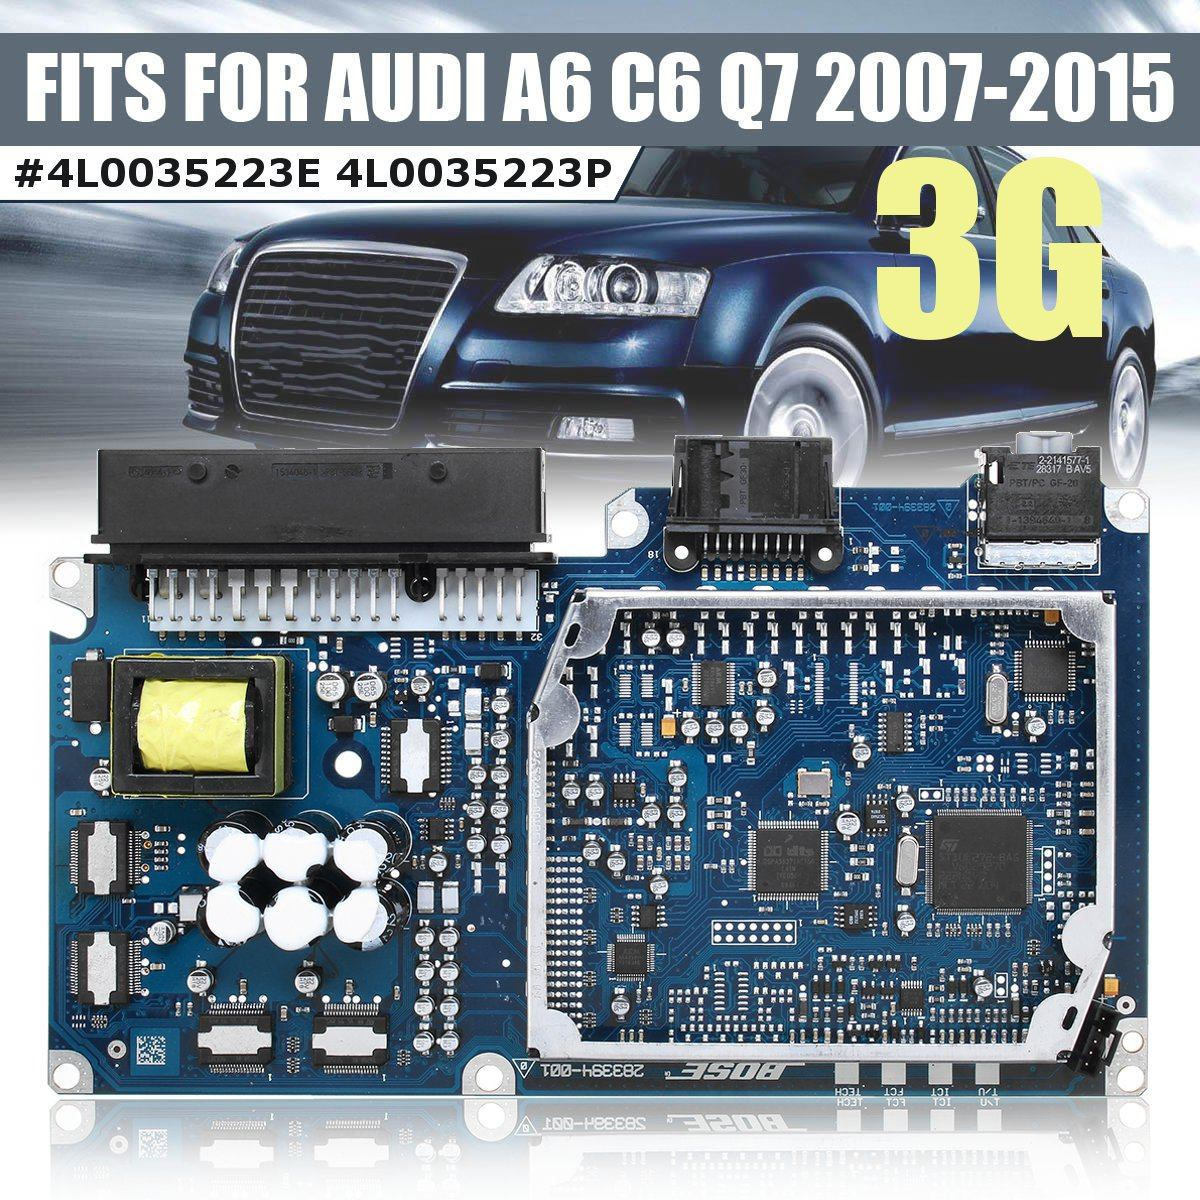 Cheap Sale Optical Fiber Multimedia Power Amplifier Board 3g 2g For Audi A6 C6 Q7 2007 2008 2009 2010 2011 2012 2013 2014 2015 #4l0035223e Wide Varieties